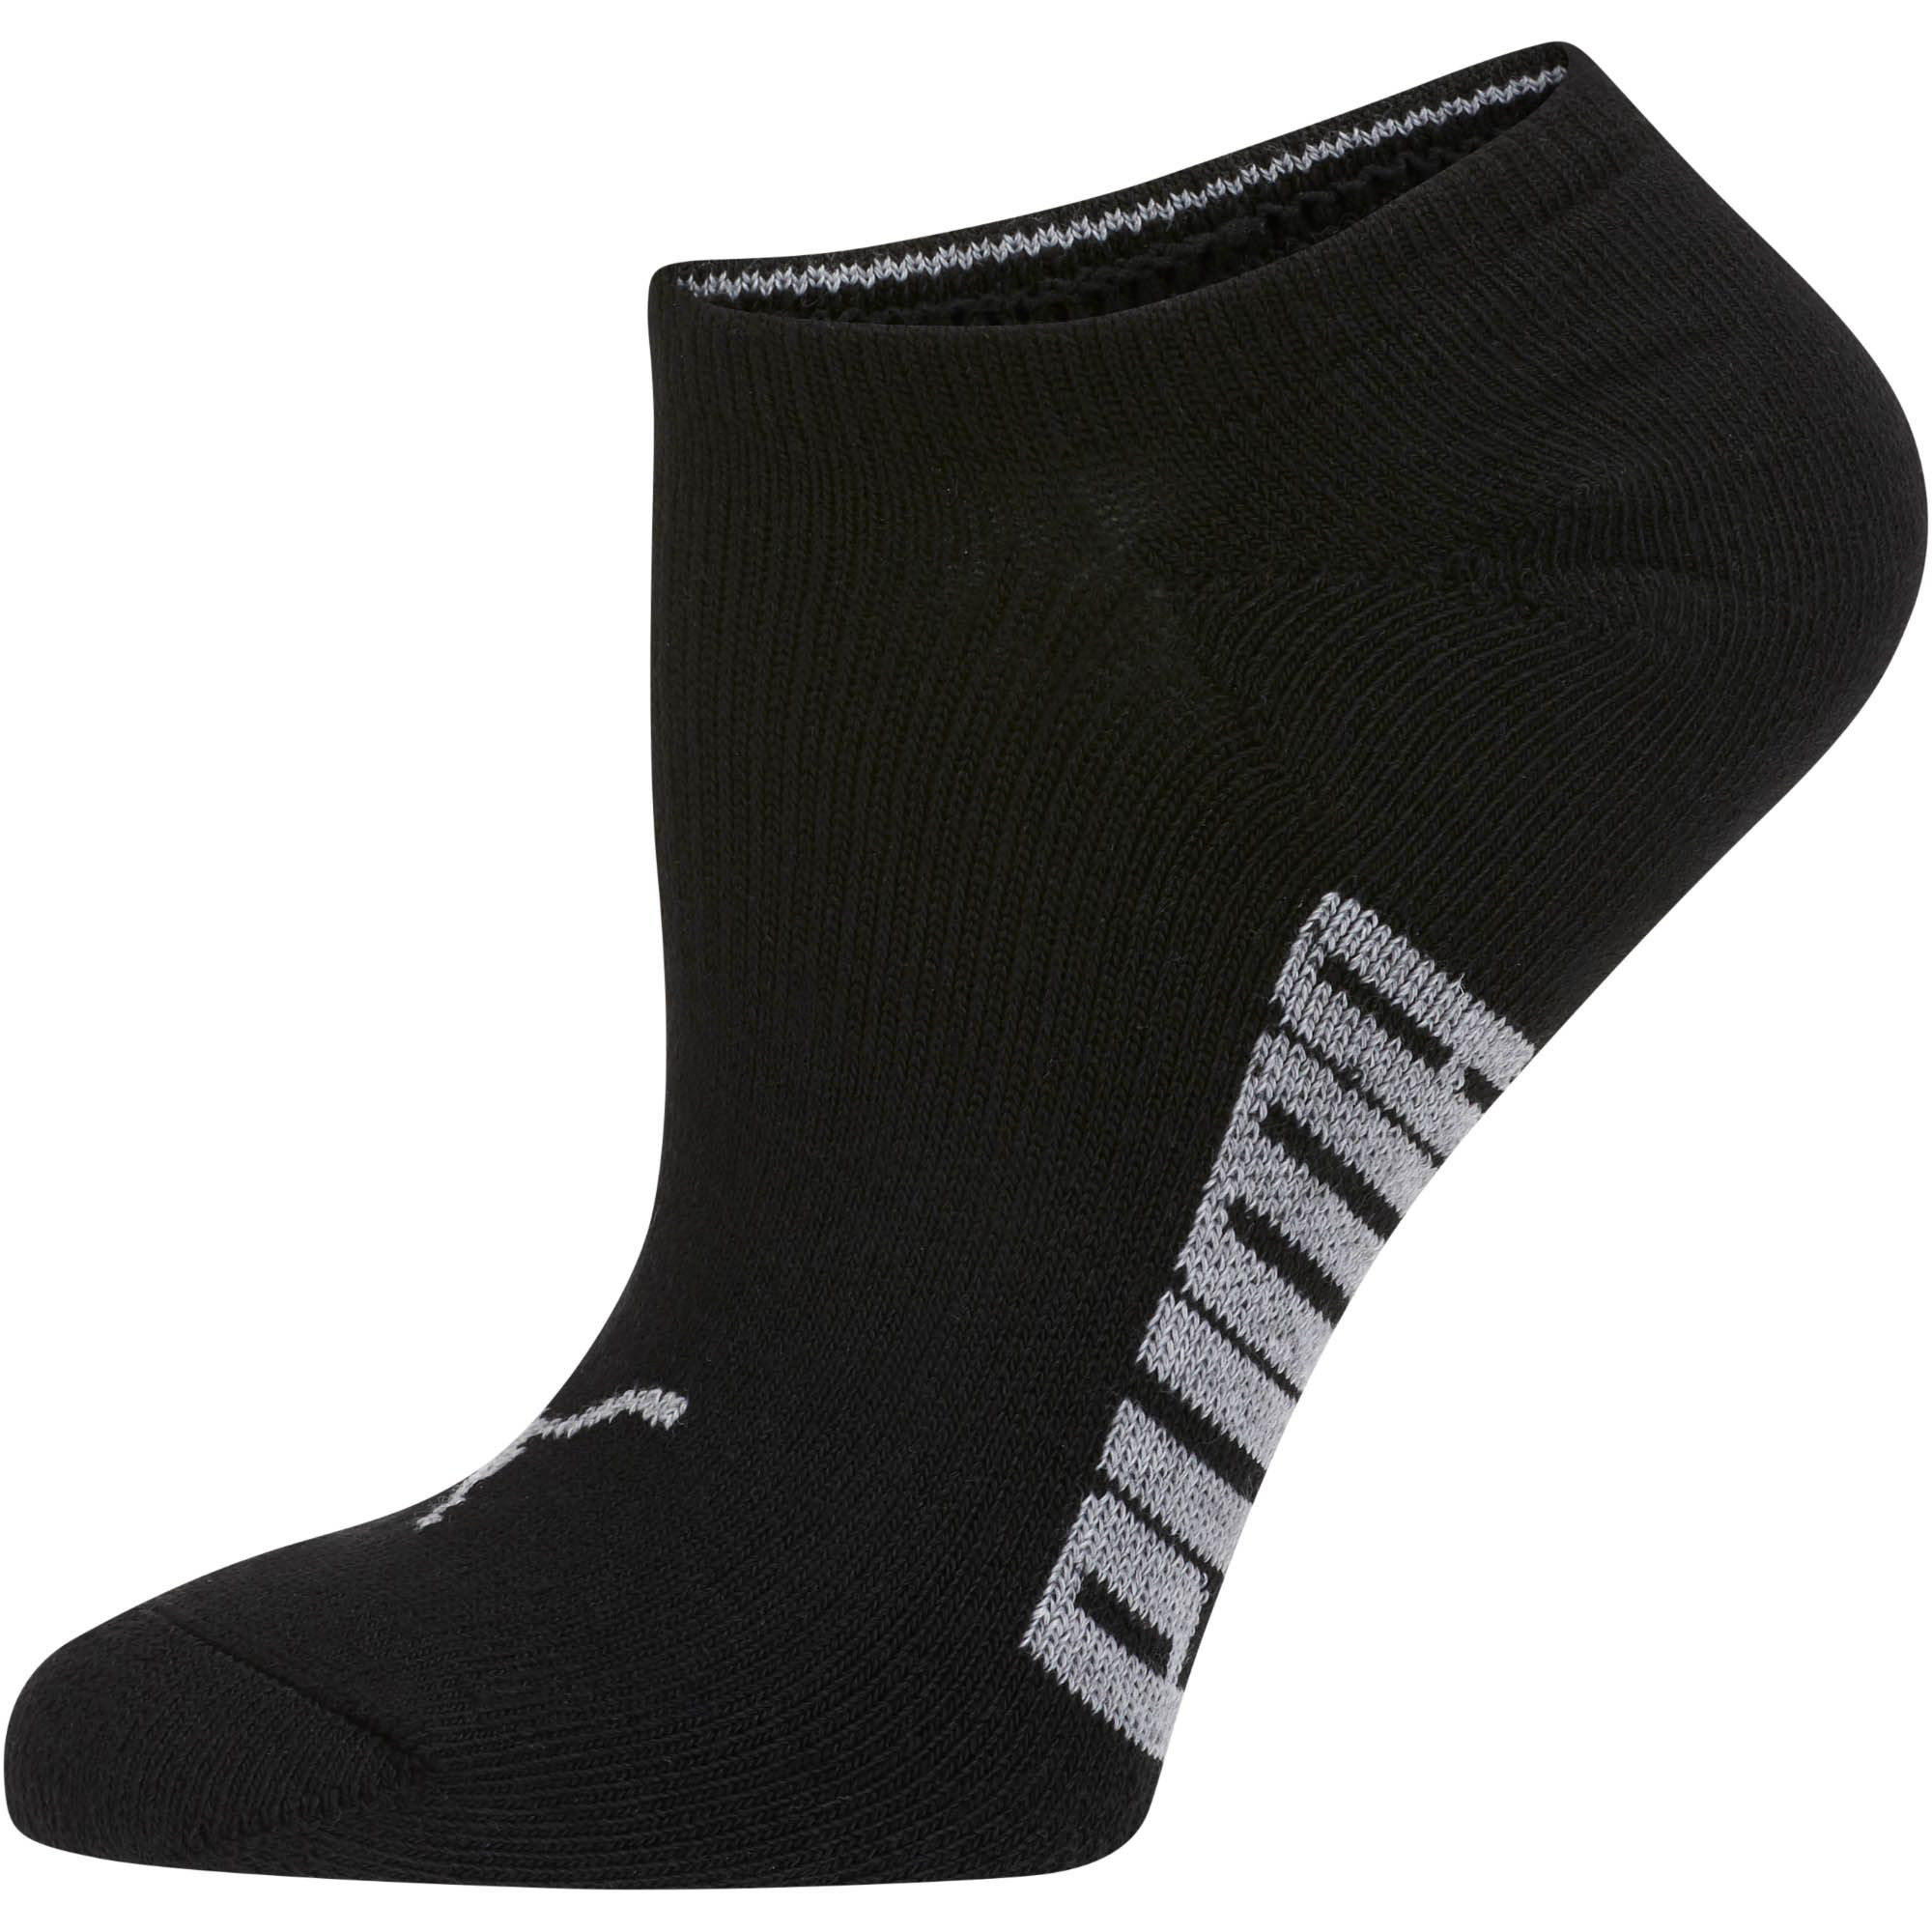 Licence-Women-s-Invisible-No-Show-Socks-3-Pack-Women-Socks-3-Pack thumbnail 4